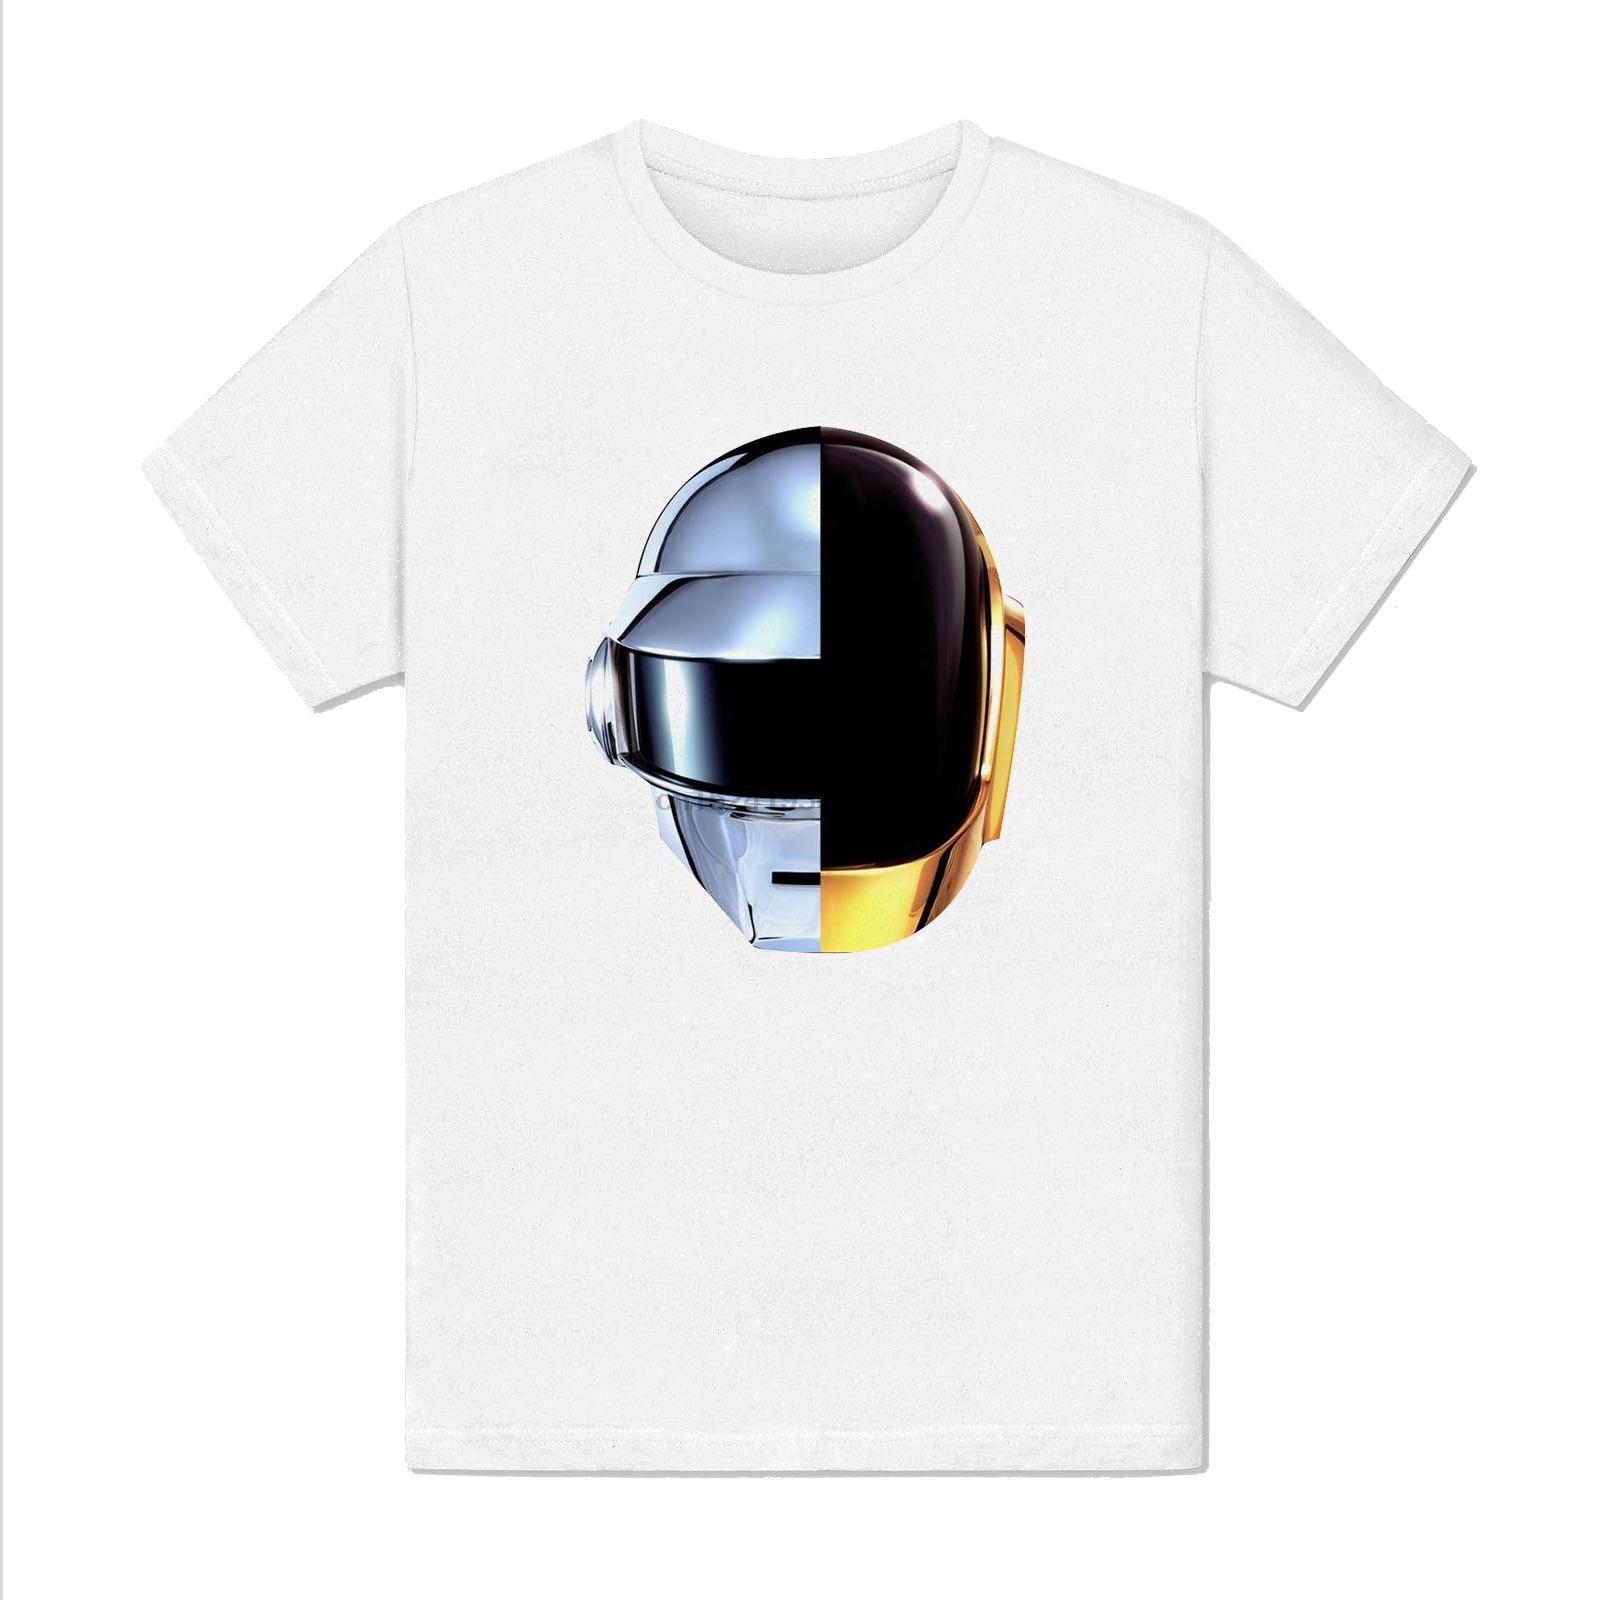 Футболка Homme Blanc-Daft, панк, Casque Harder Better Faster strong Musique, футболка с коротким рукавом, модная футболка